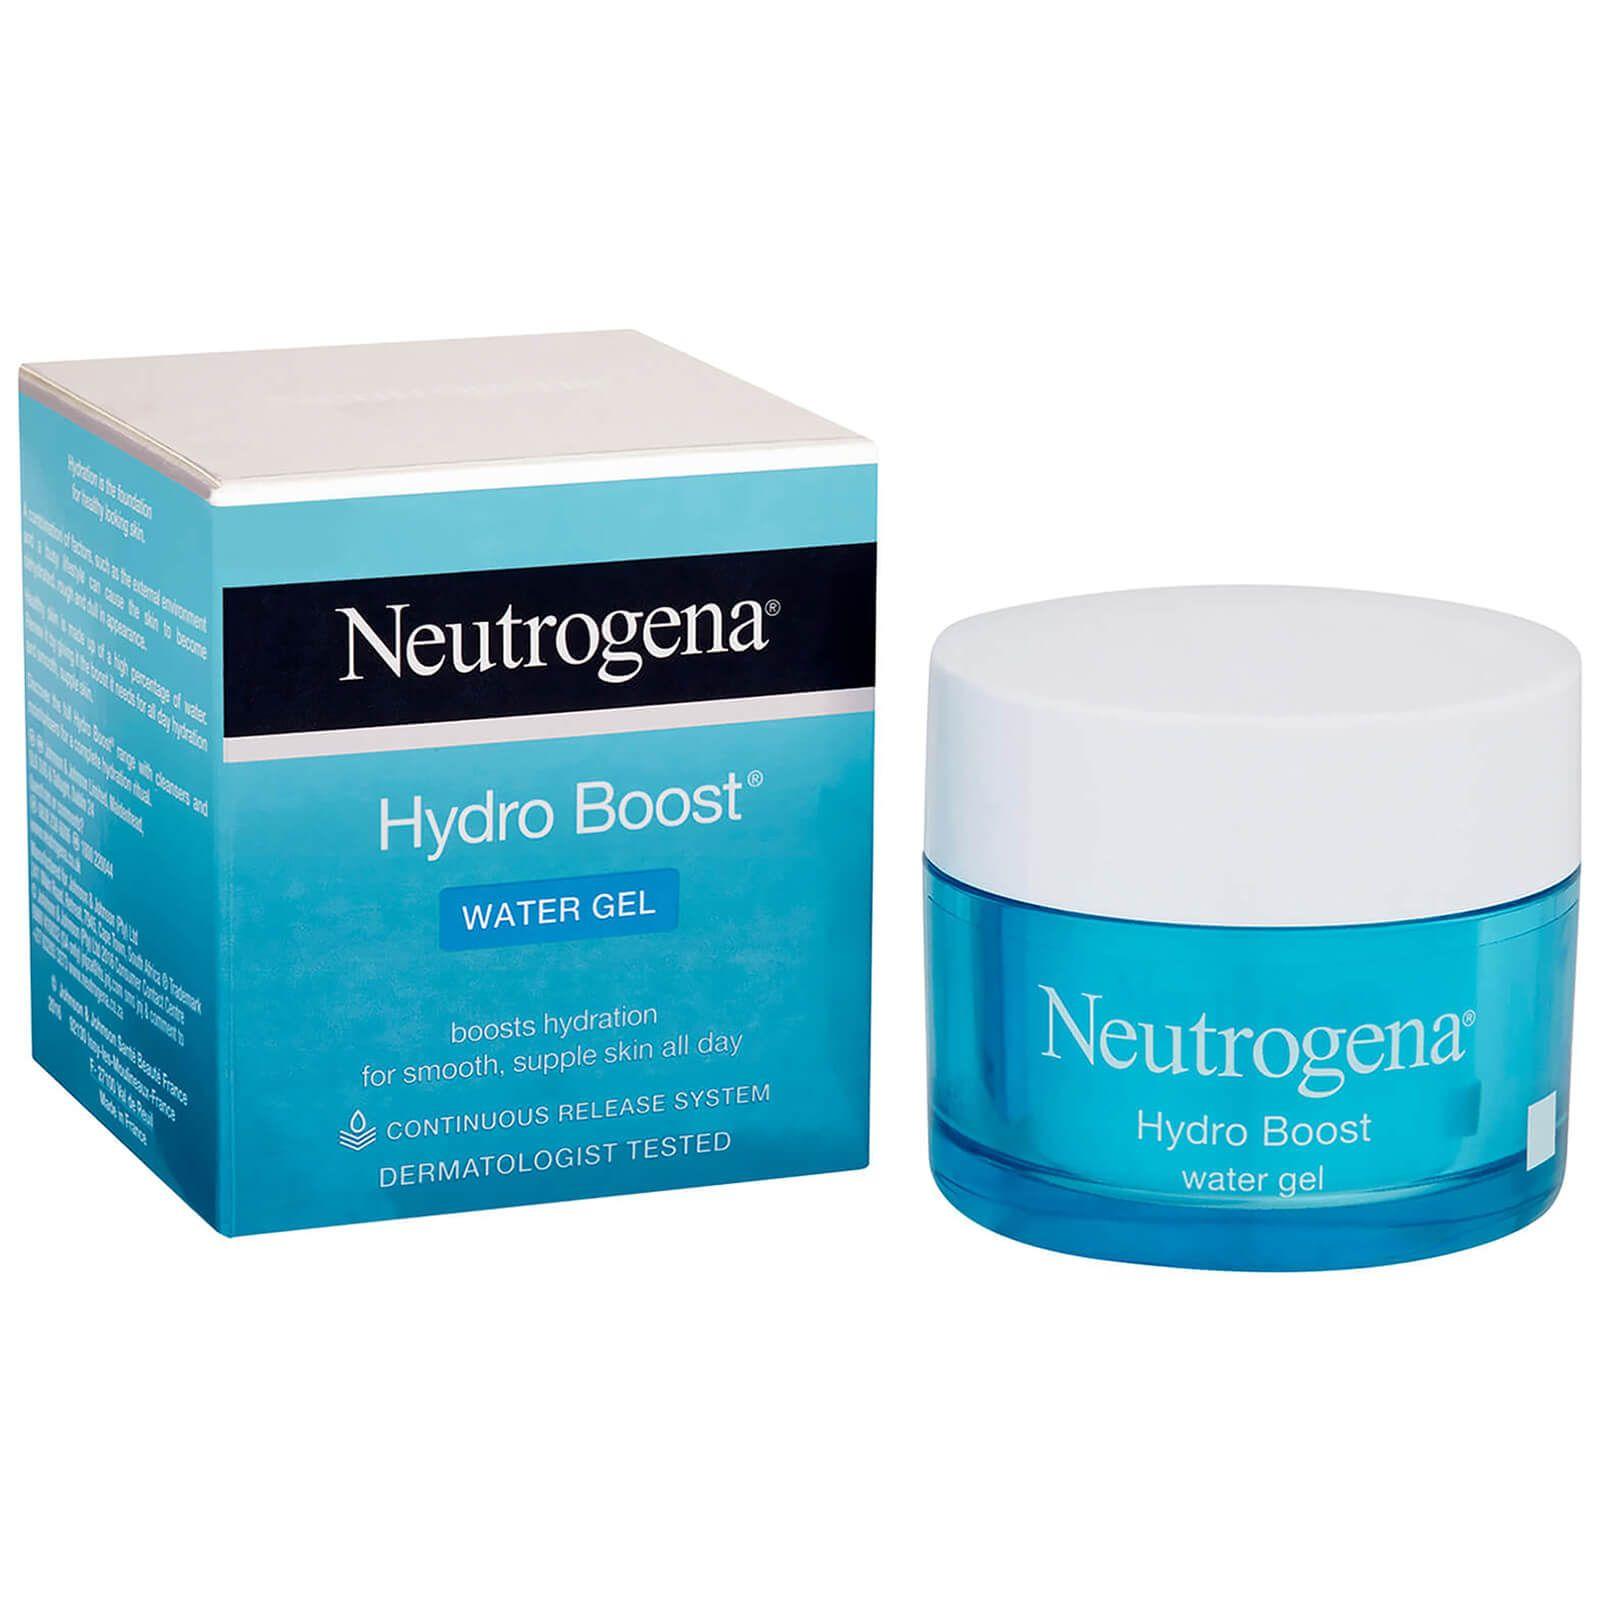 Neutrogena Hydro Boost Water Gel Moisturiser 50ml in 2020